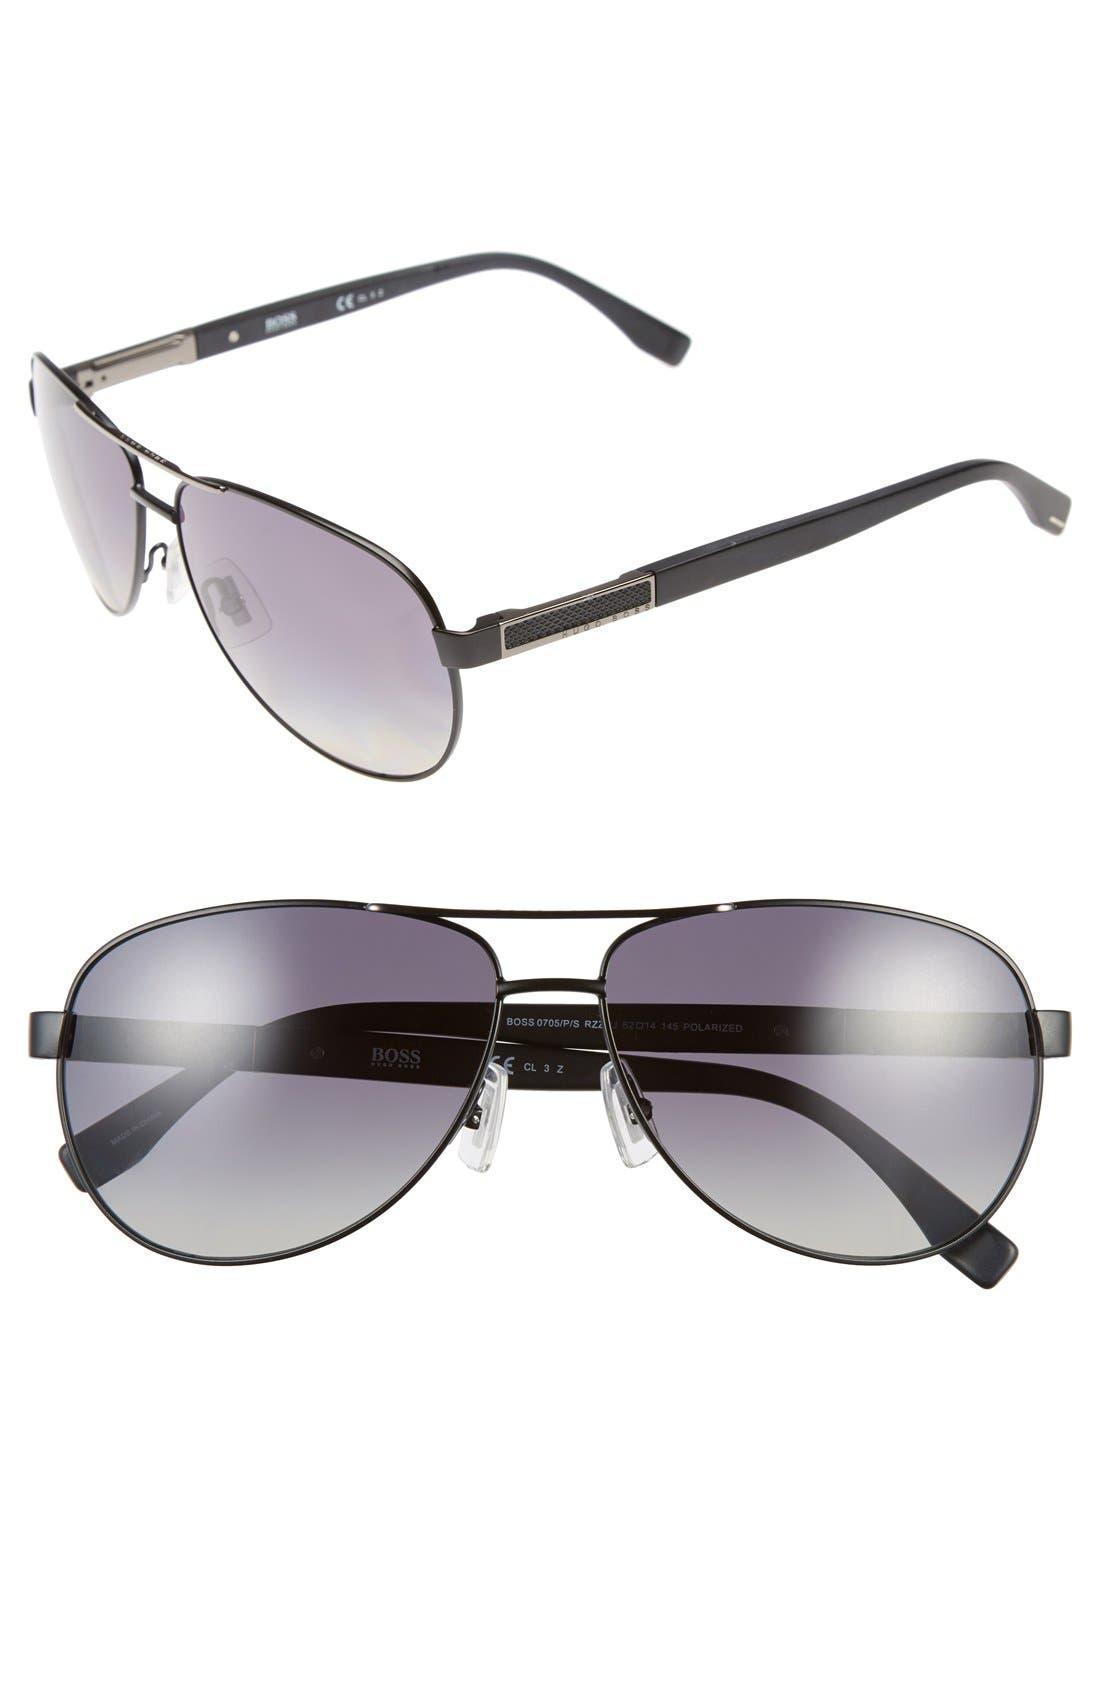 62mm Polarized Aviator Sunglasses,                             Main thumbnail 2, color,